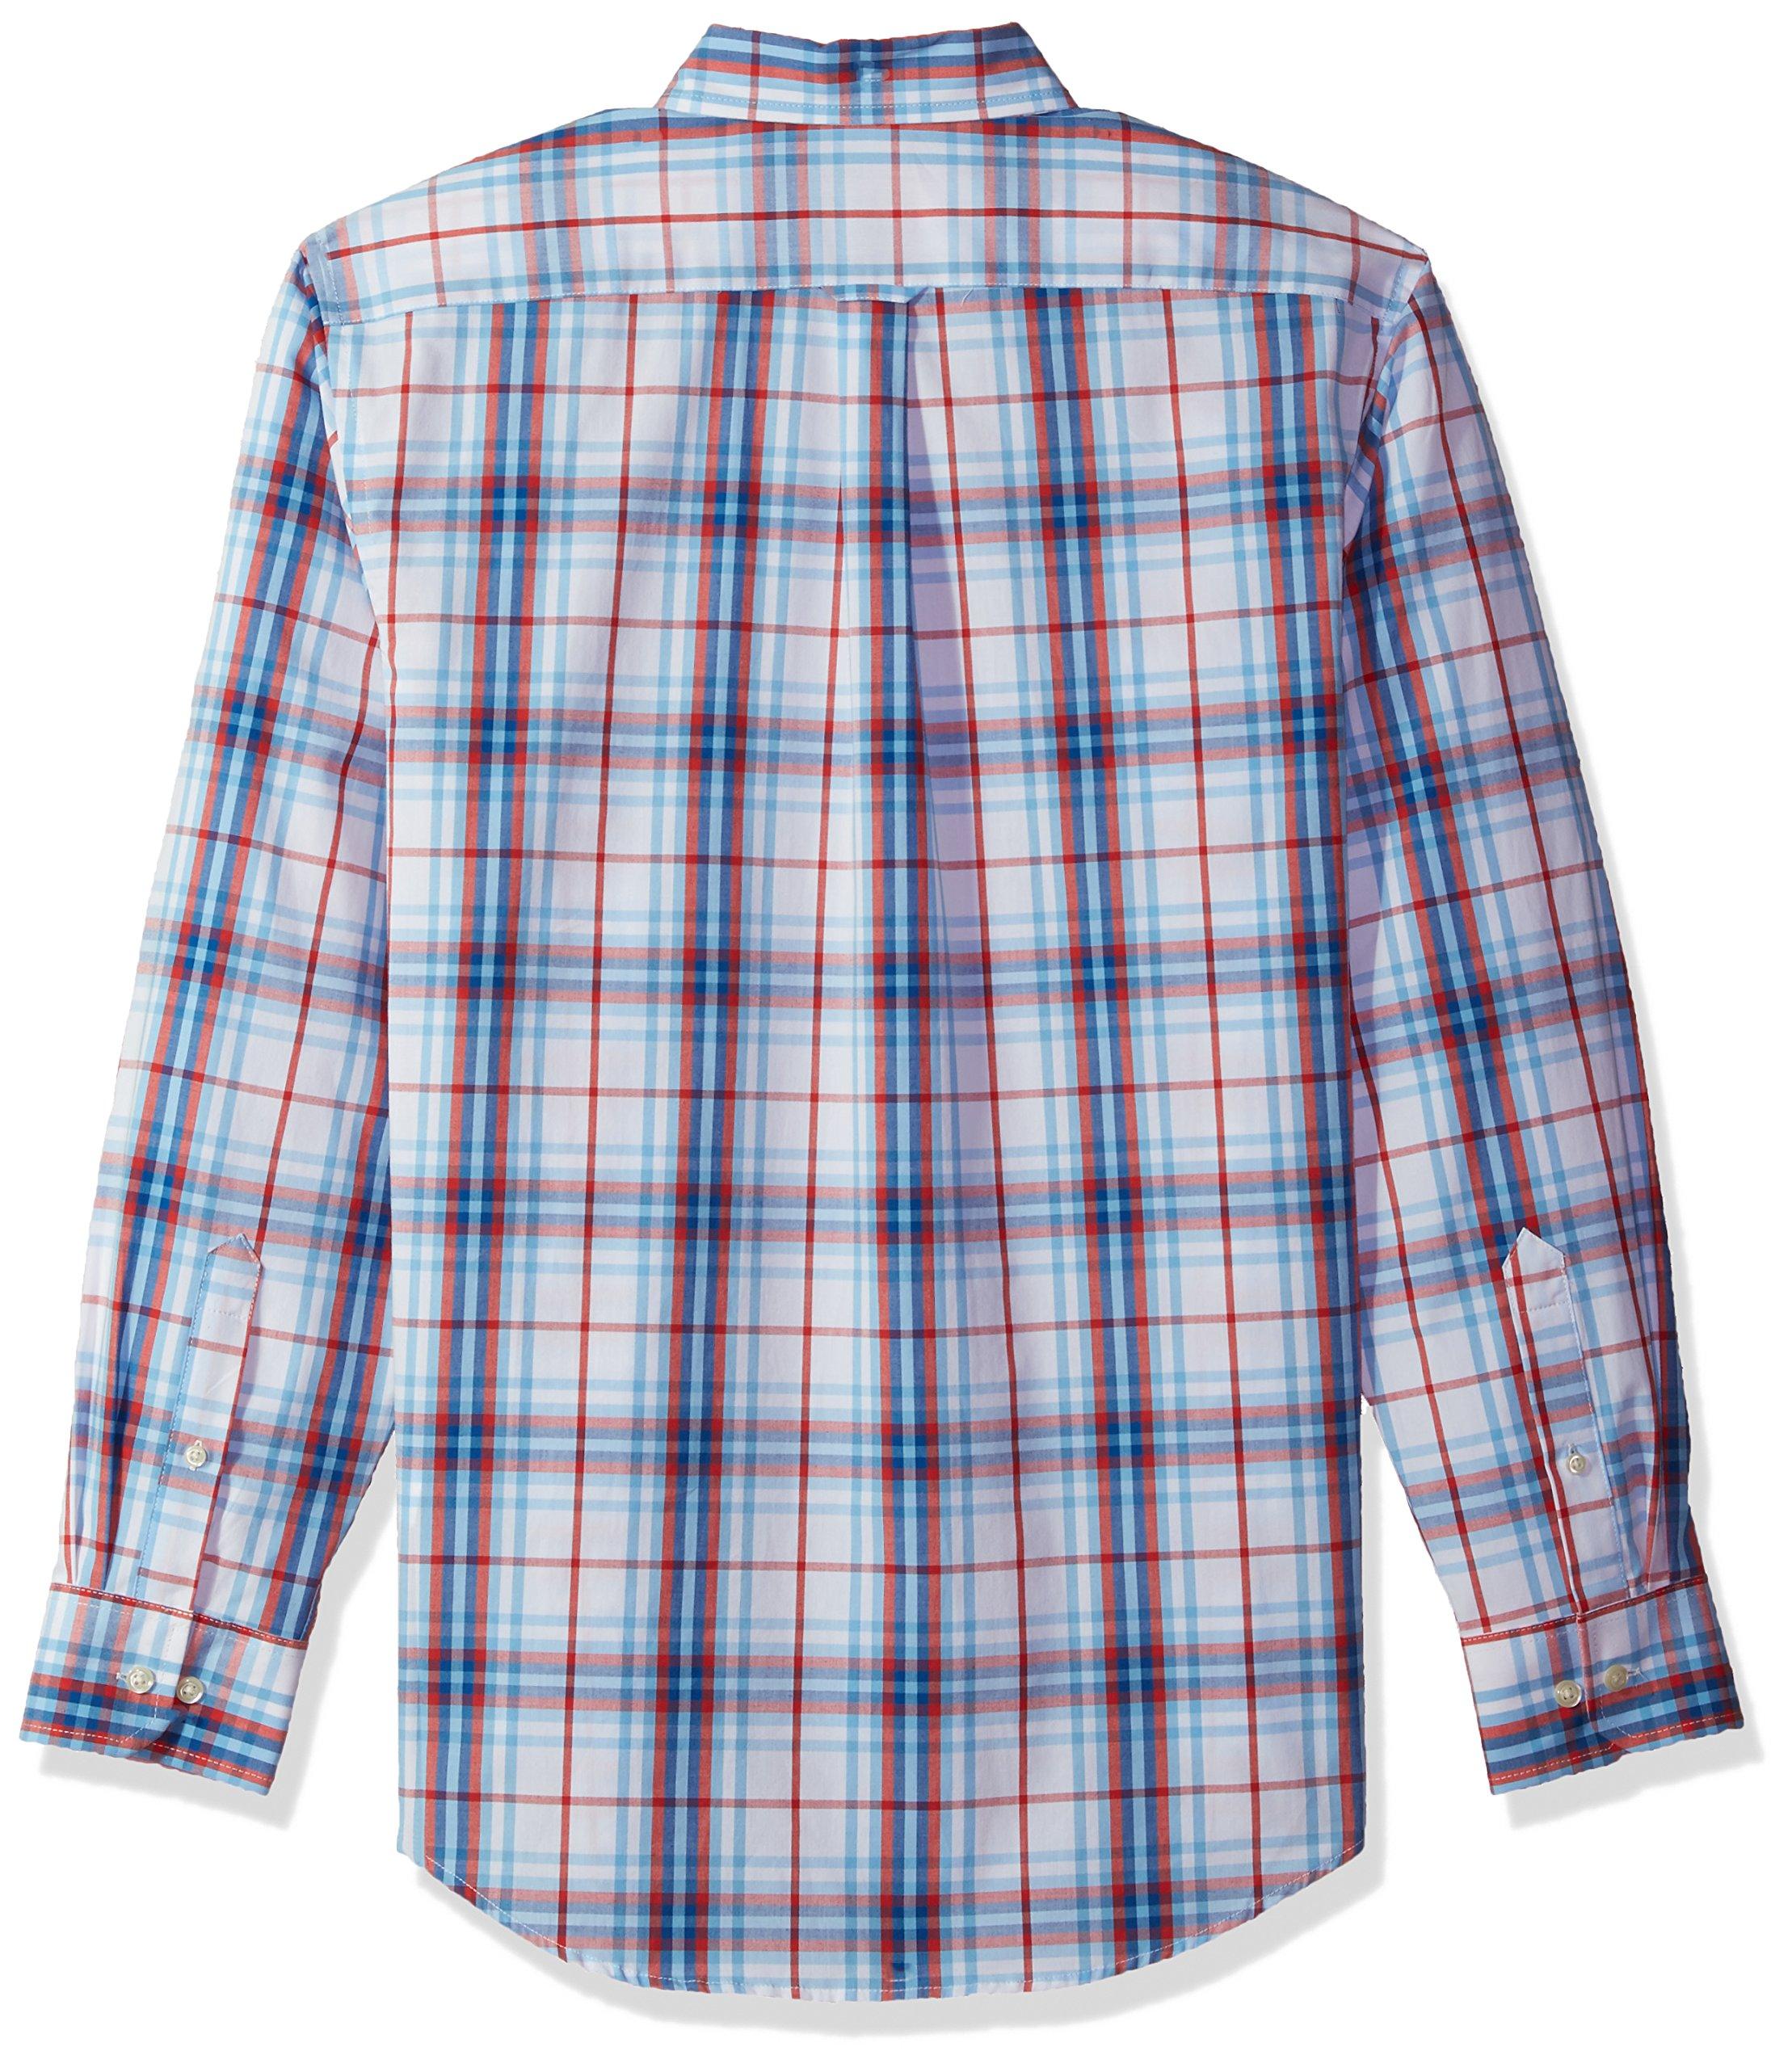 Izod Mens Essential Check Long Sleeve Shirt Regular And Slim Fit